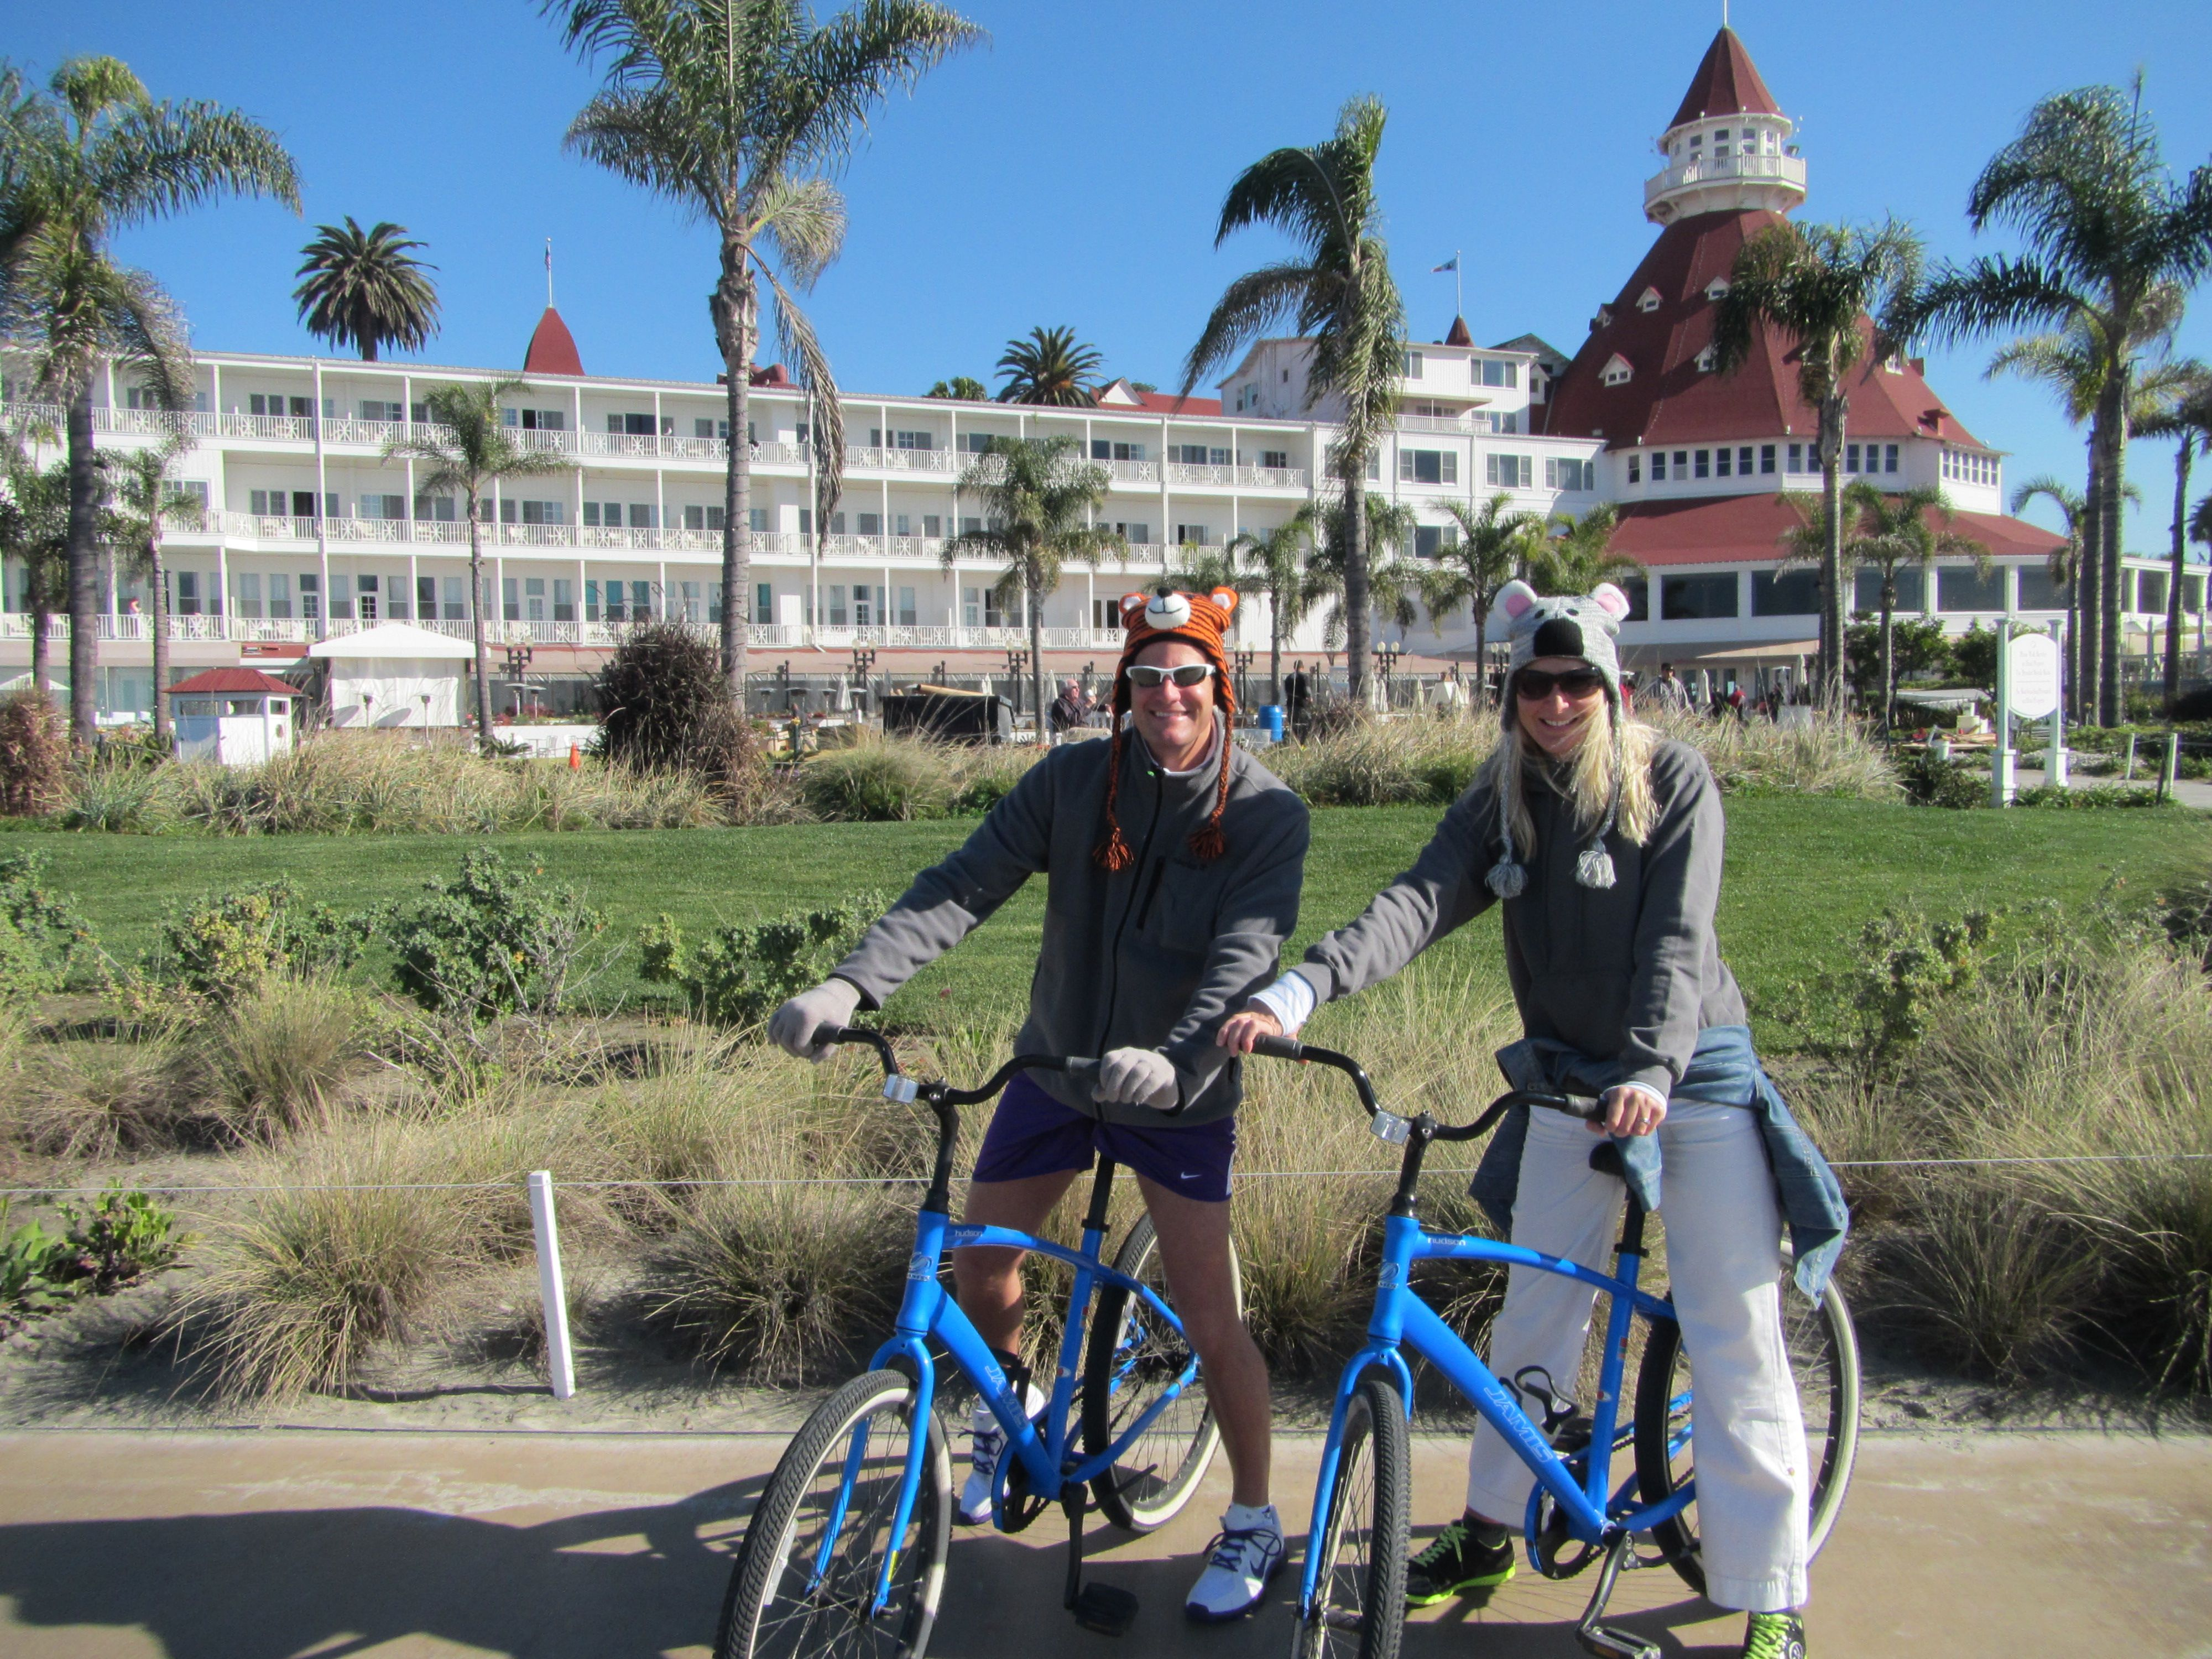 Bicycle tour of Del Coronado Hotel, San Diego with Sean & Cassandra Rox: https://www.roxbeachweddings.com/san-diego/